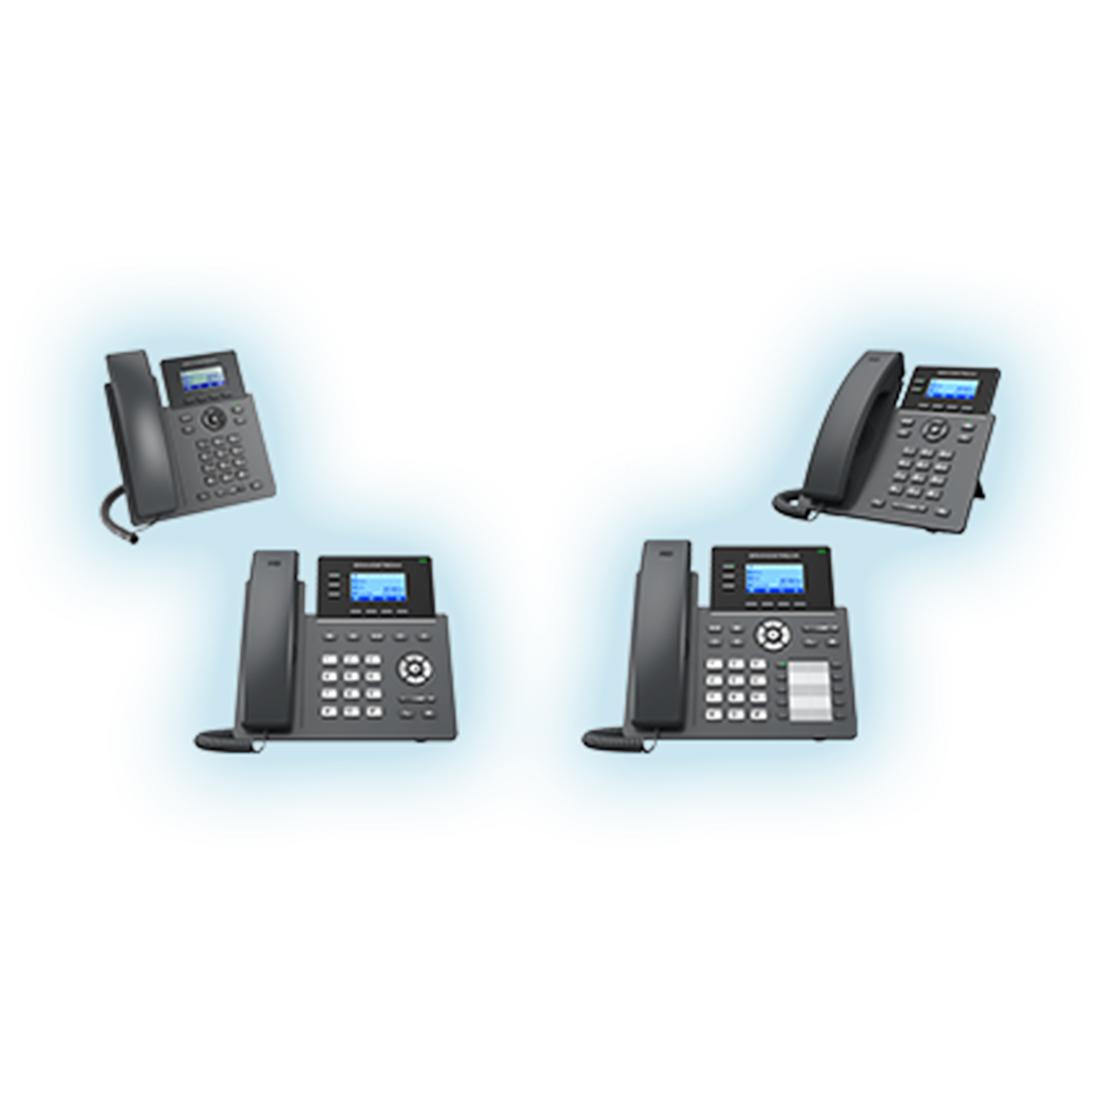 Telefoane voce IP Carrier-Grade Essential seria GRP